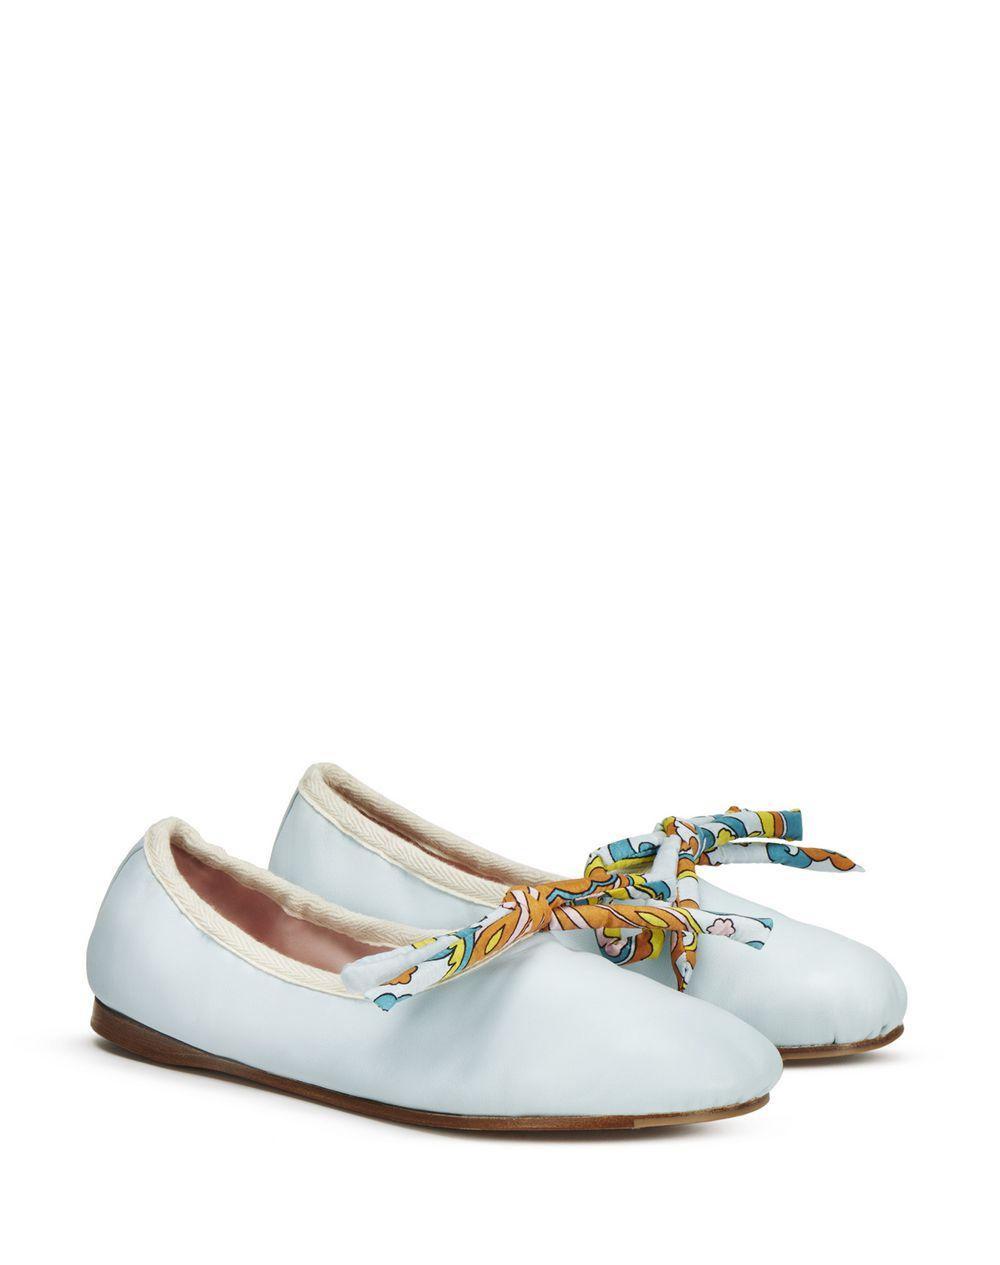 FLOWER SWIRL PRINT BOW BALLET FLAT - Lanvin